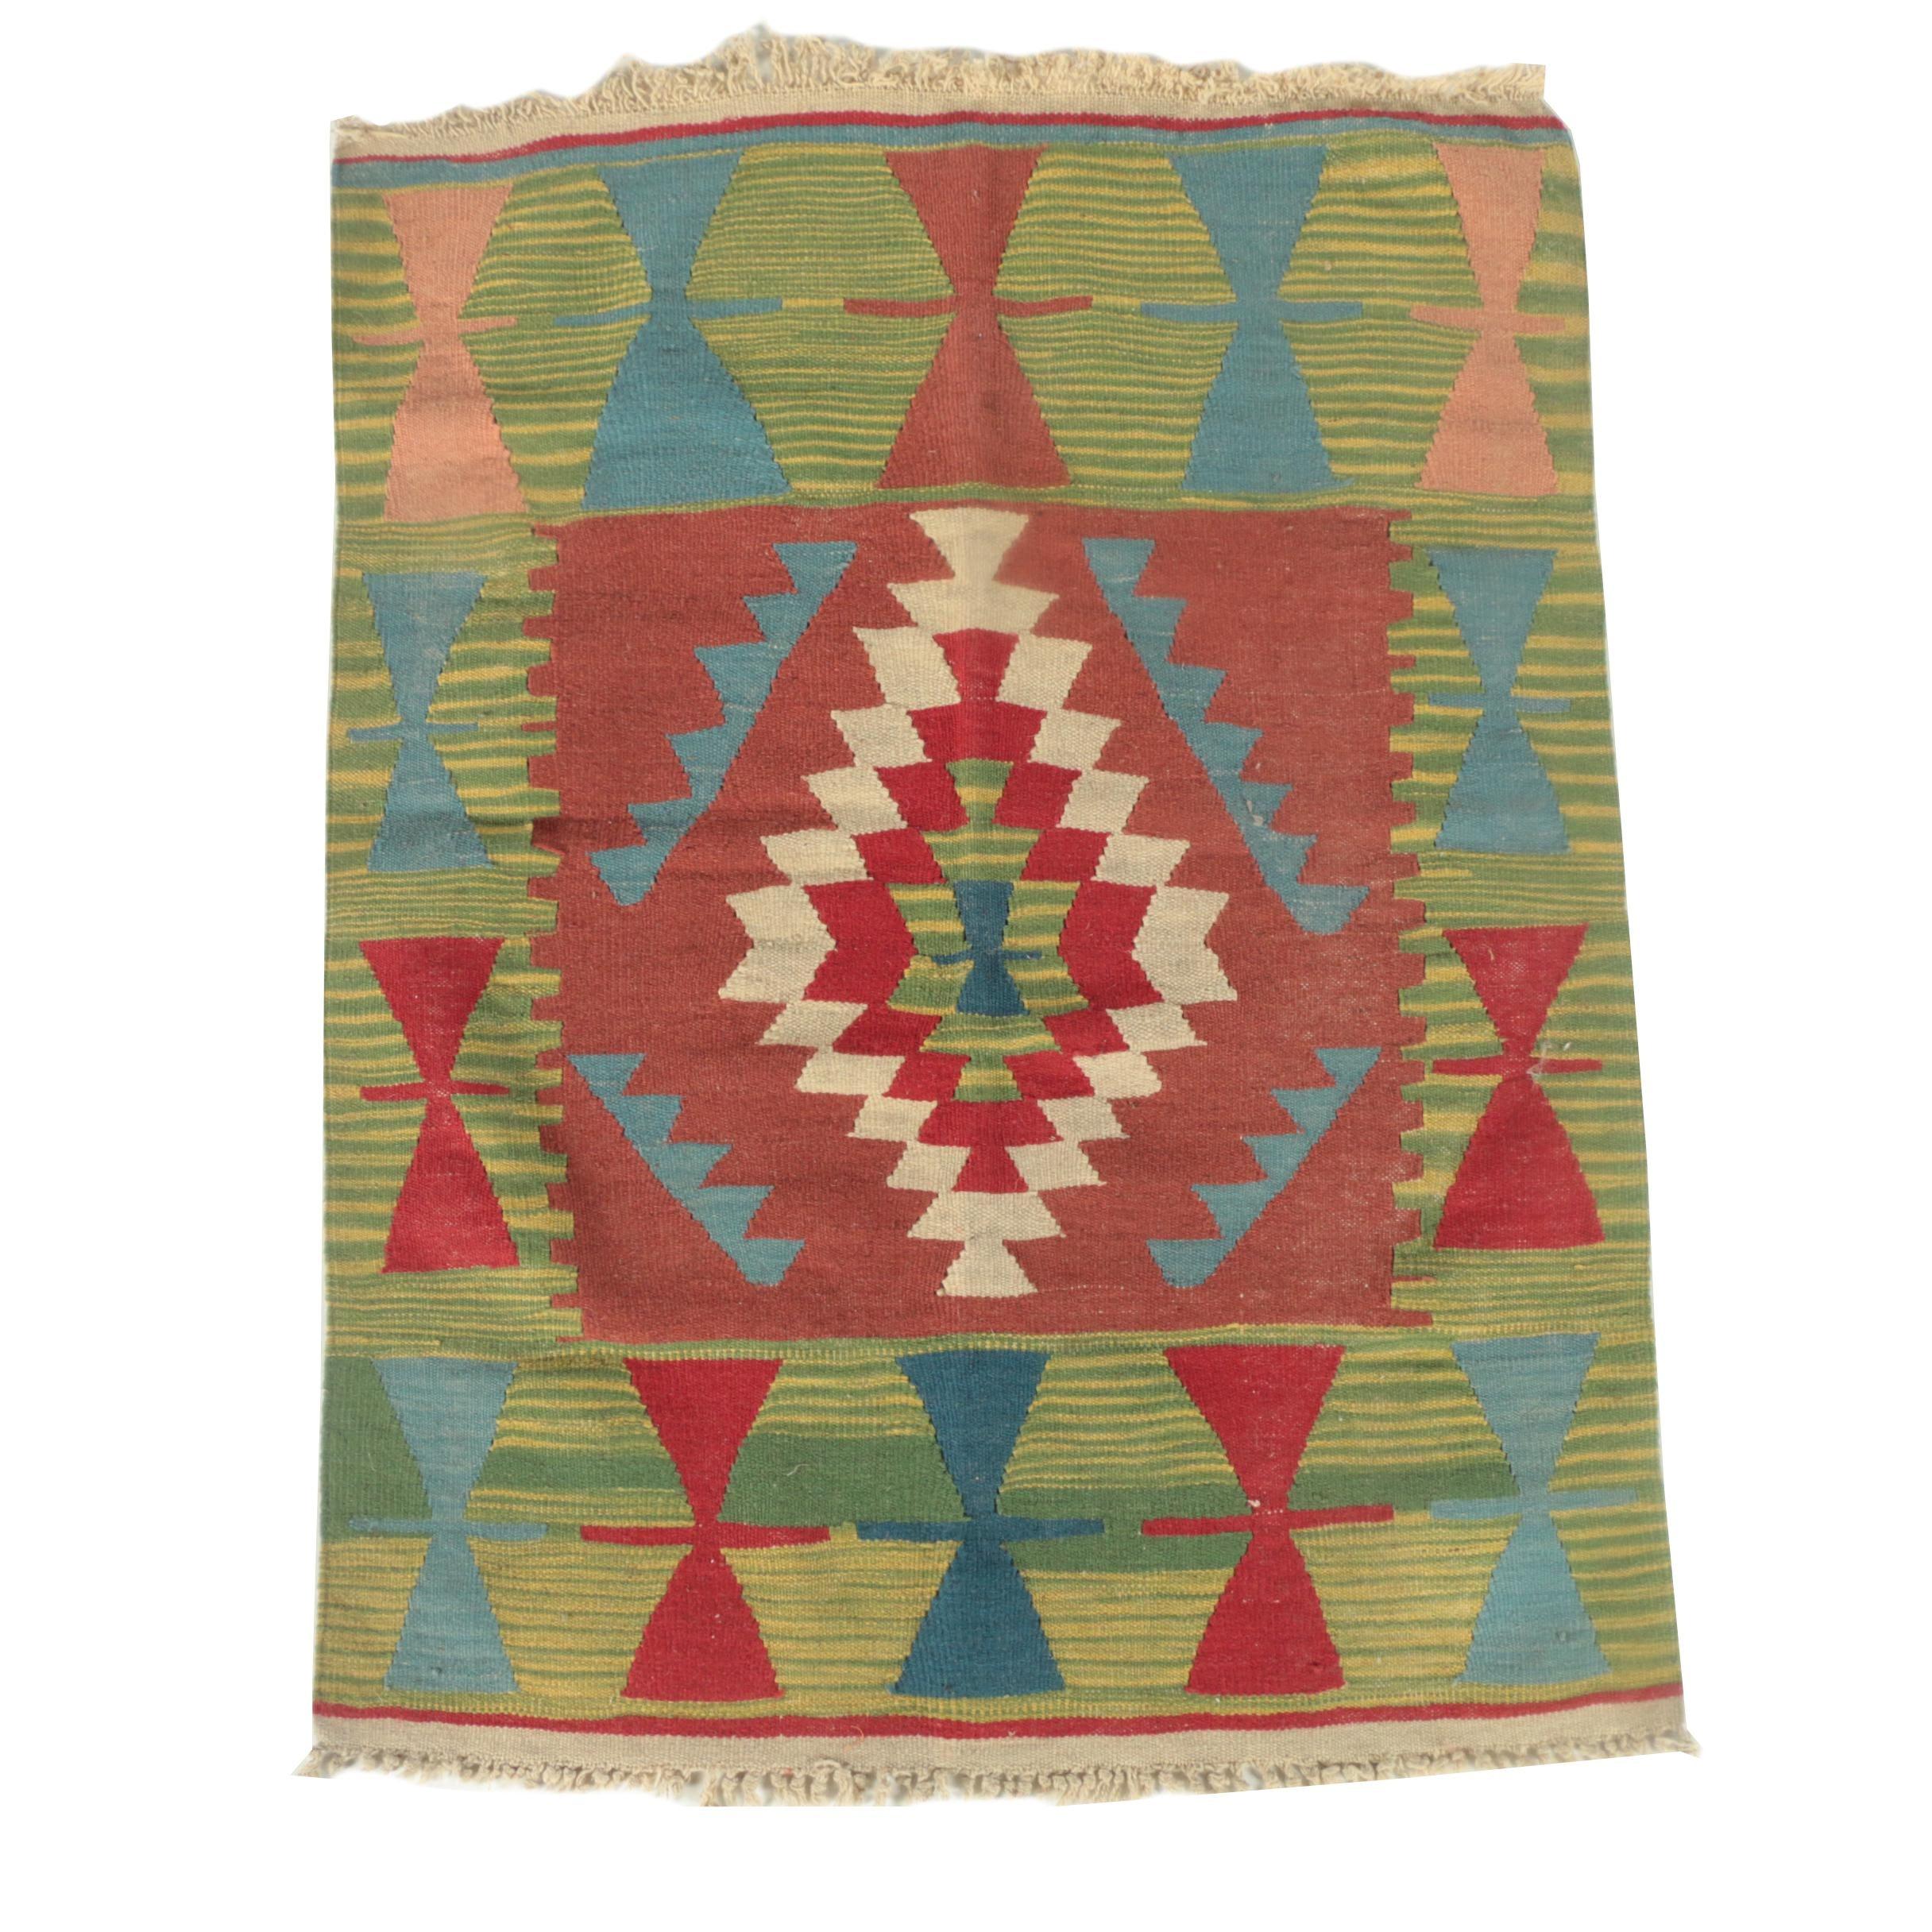 Handwoven Turkish Wool Kilim for Phoenician Imports